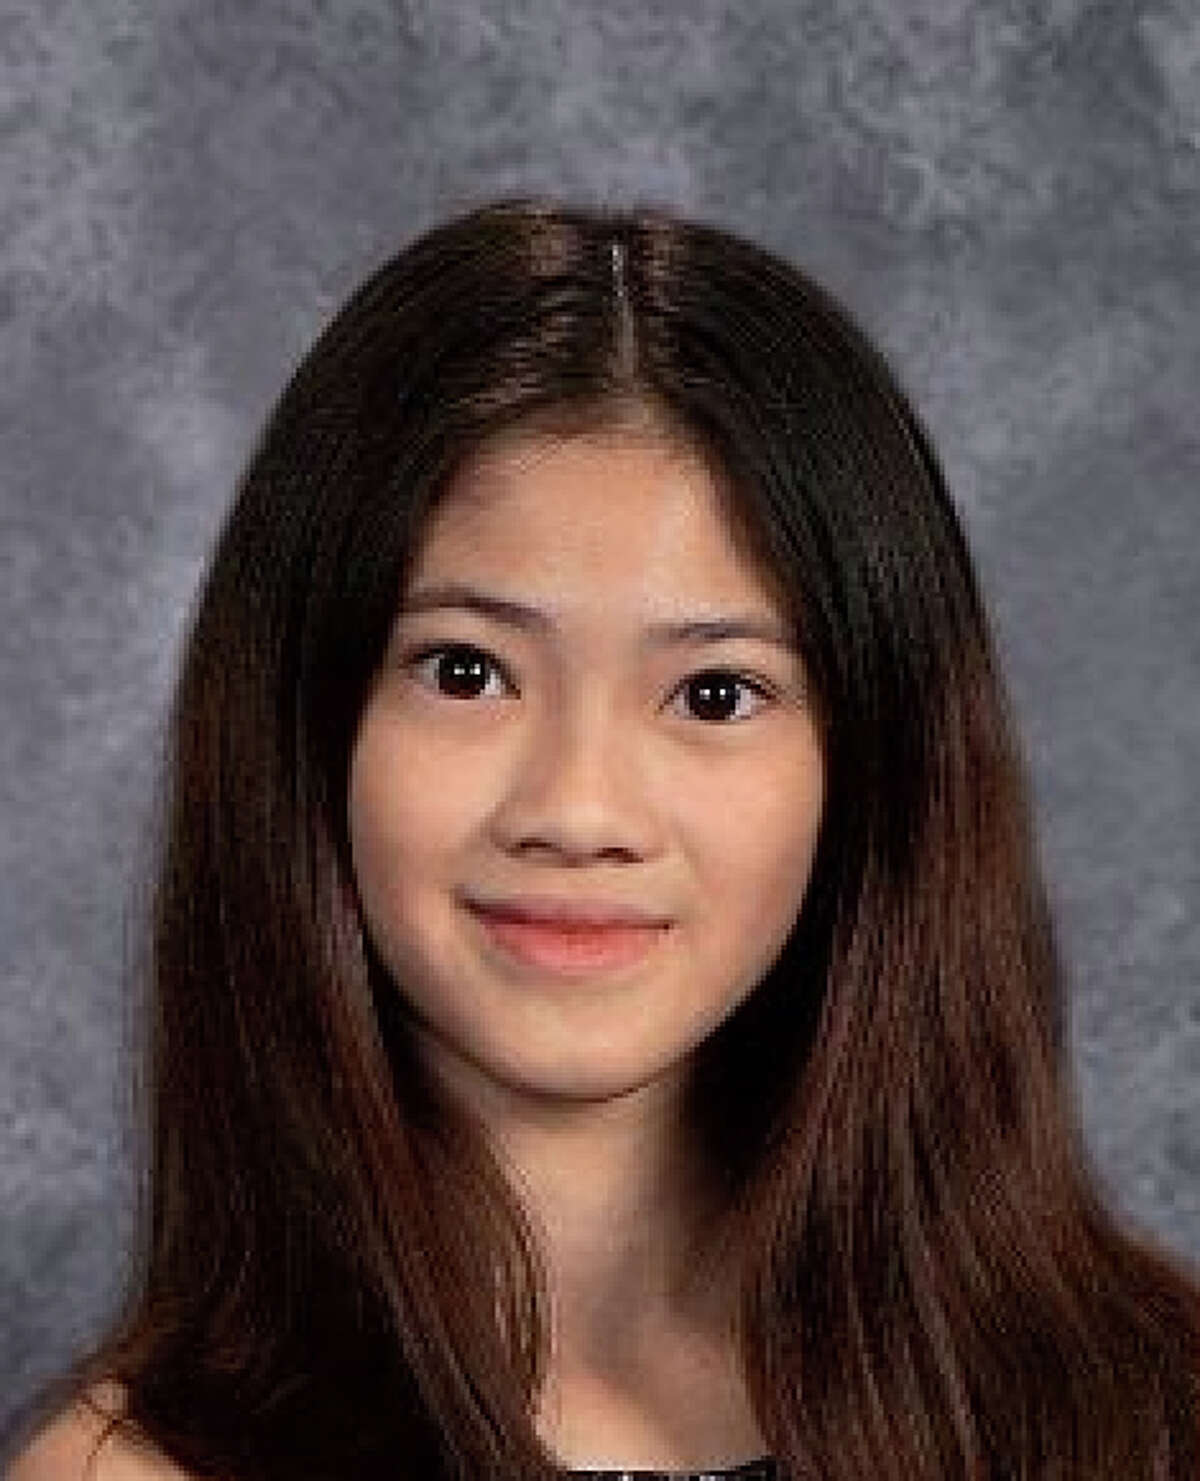 Andrews Middle School: Prayer Lorskulsint, 12, sixth grade